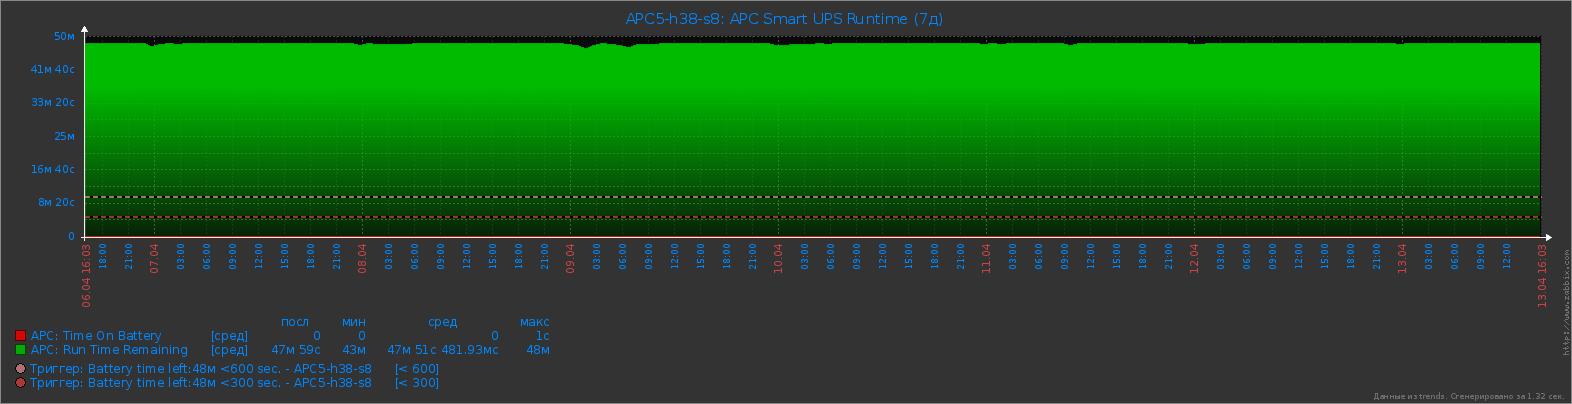 APC Smart UPS - Runtime